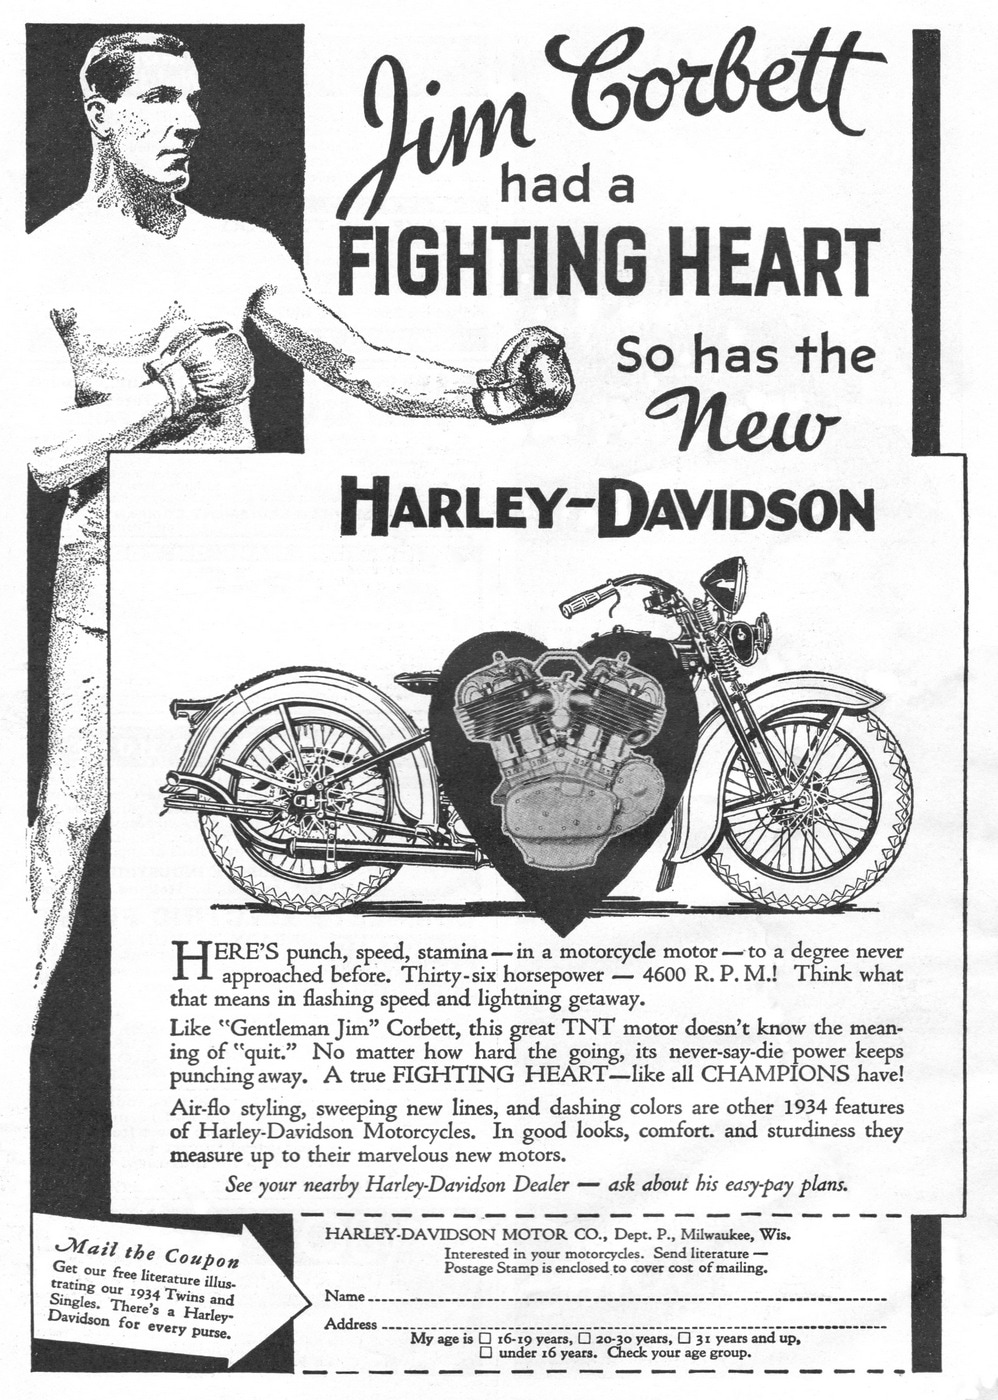 Harley-Davidson with Jim Corbett